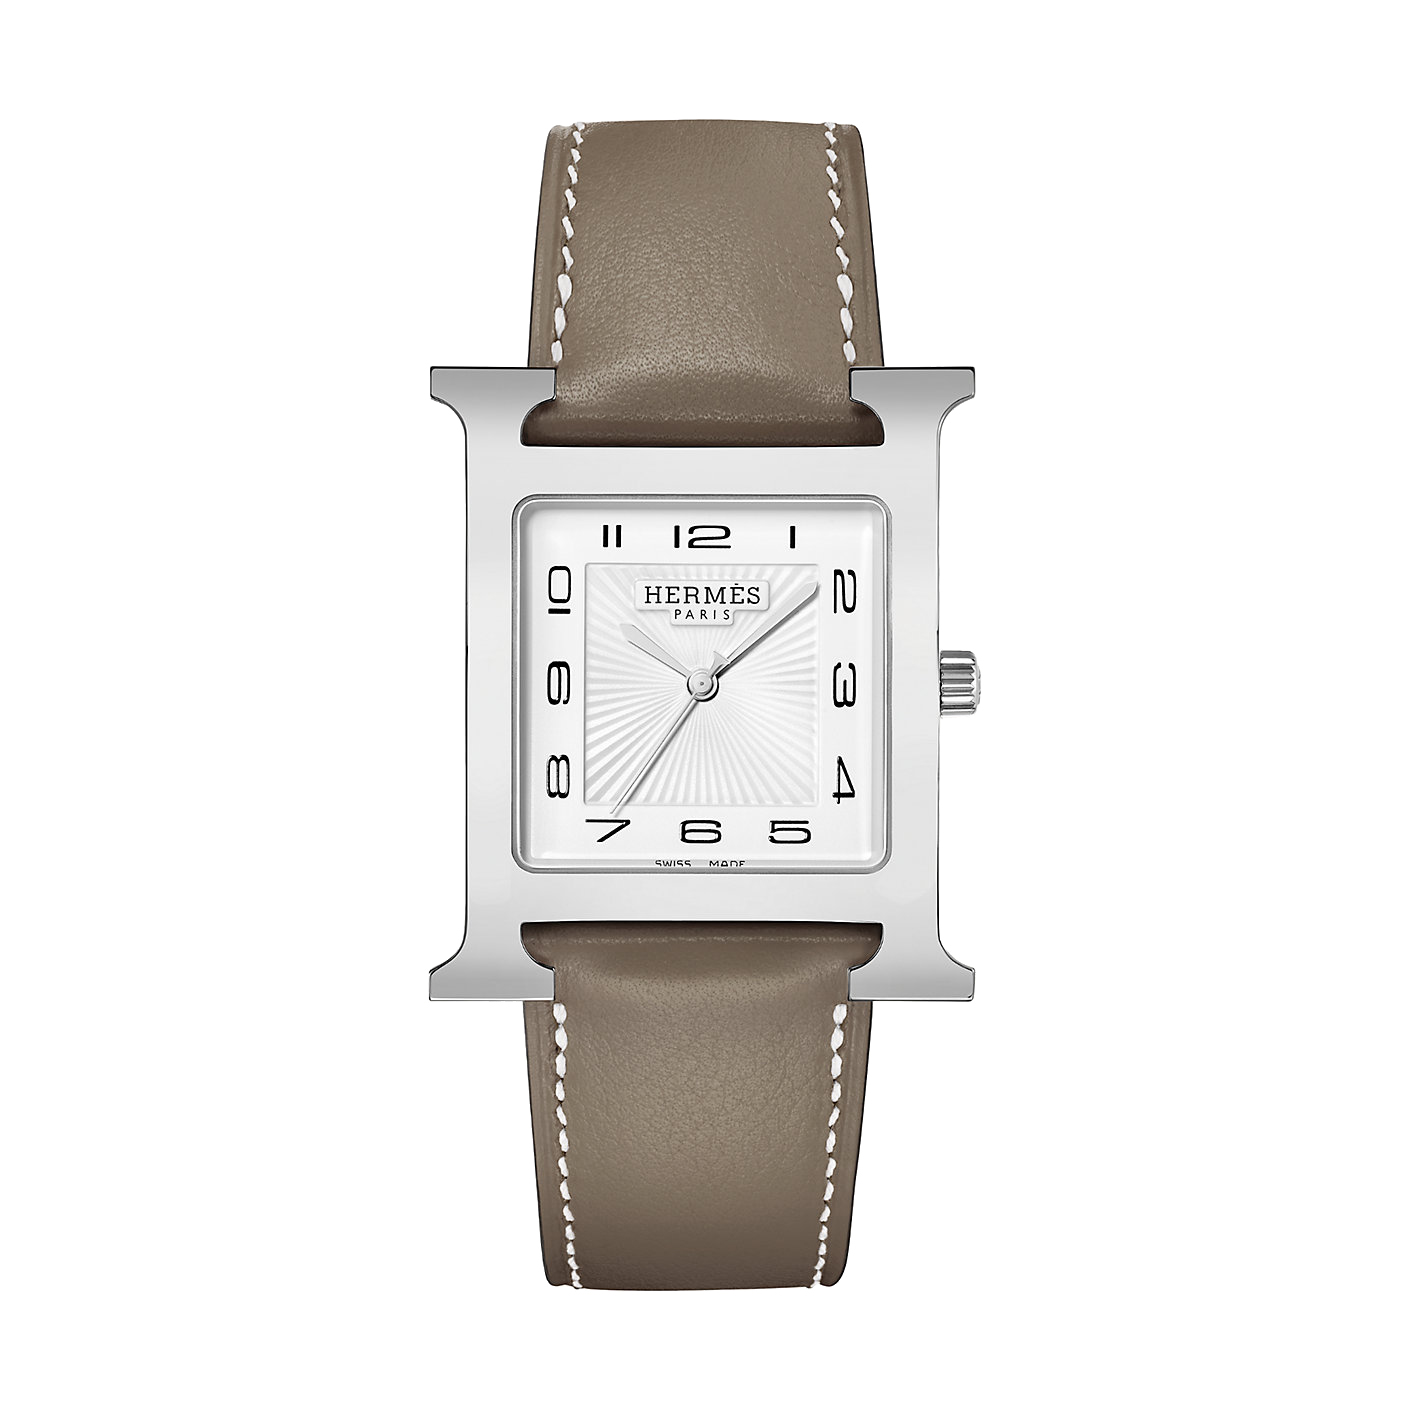 Hermès-heure-h-305-x-305mm-Hall-of-Time-036835WW00